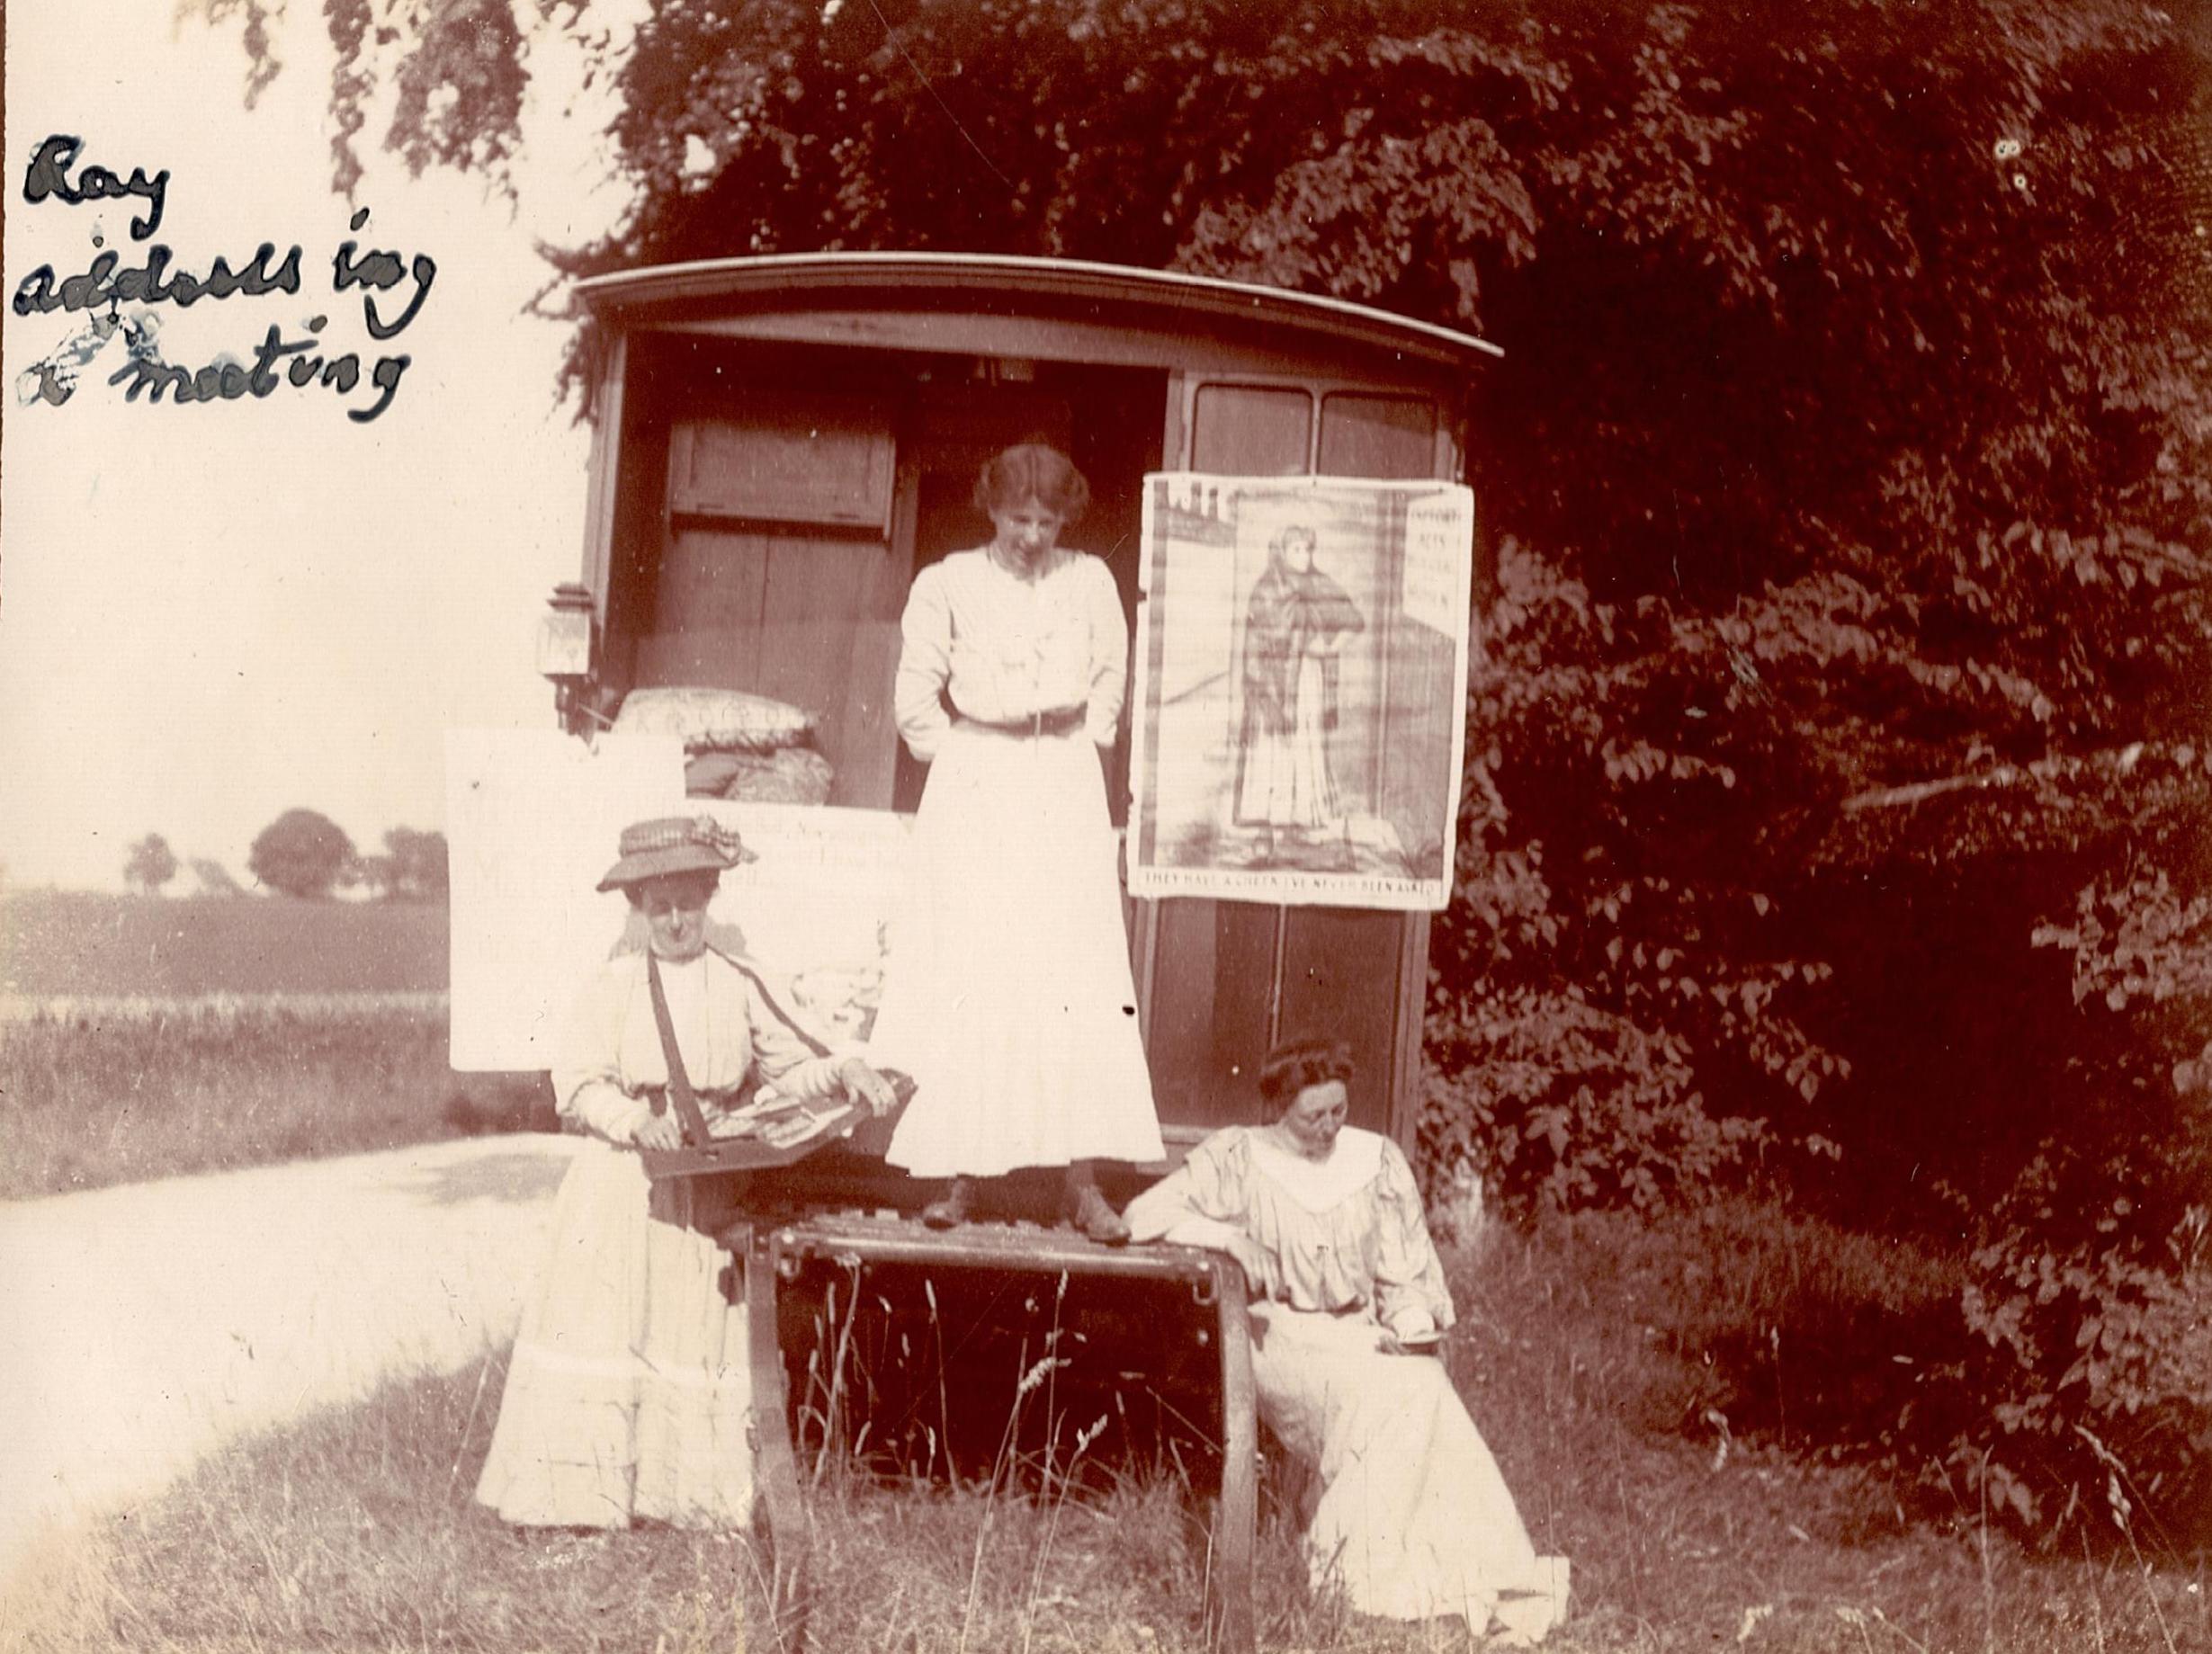 Women standing around a horse-drawn caravan